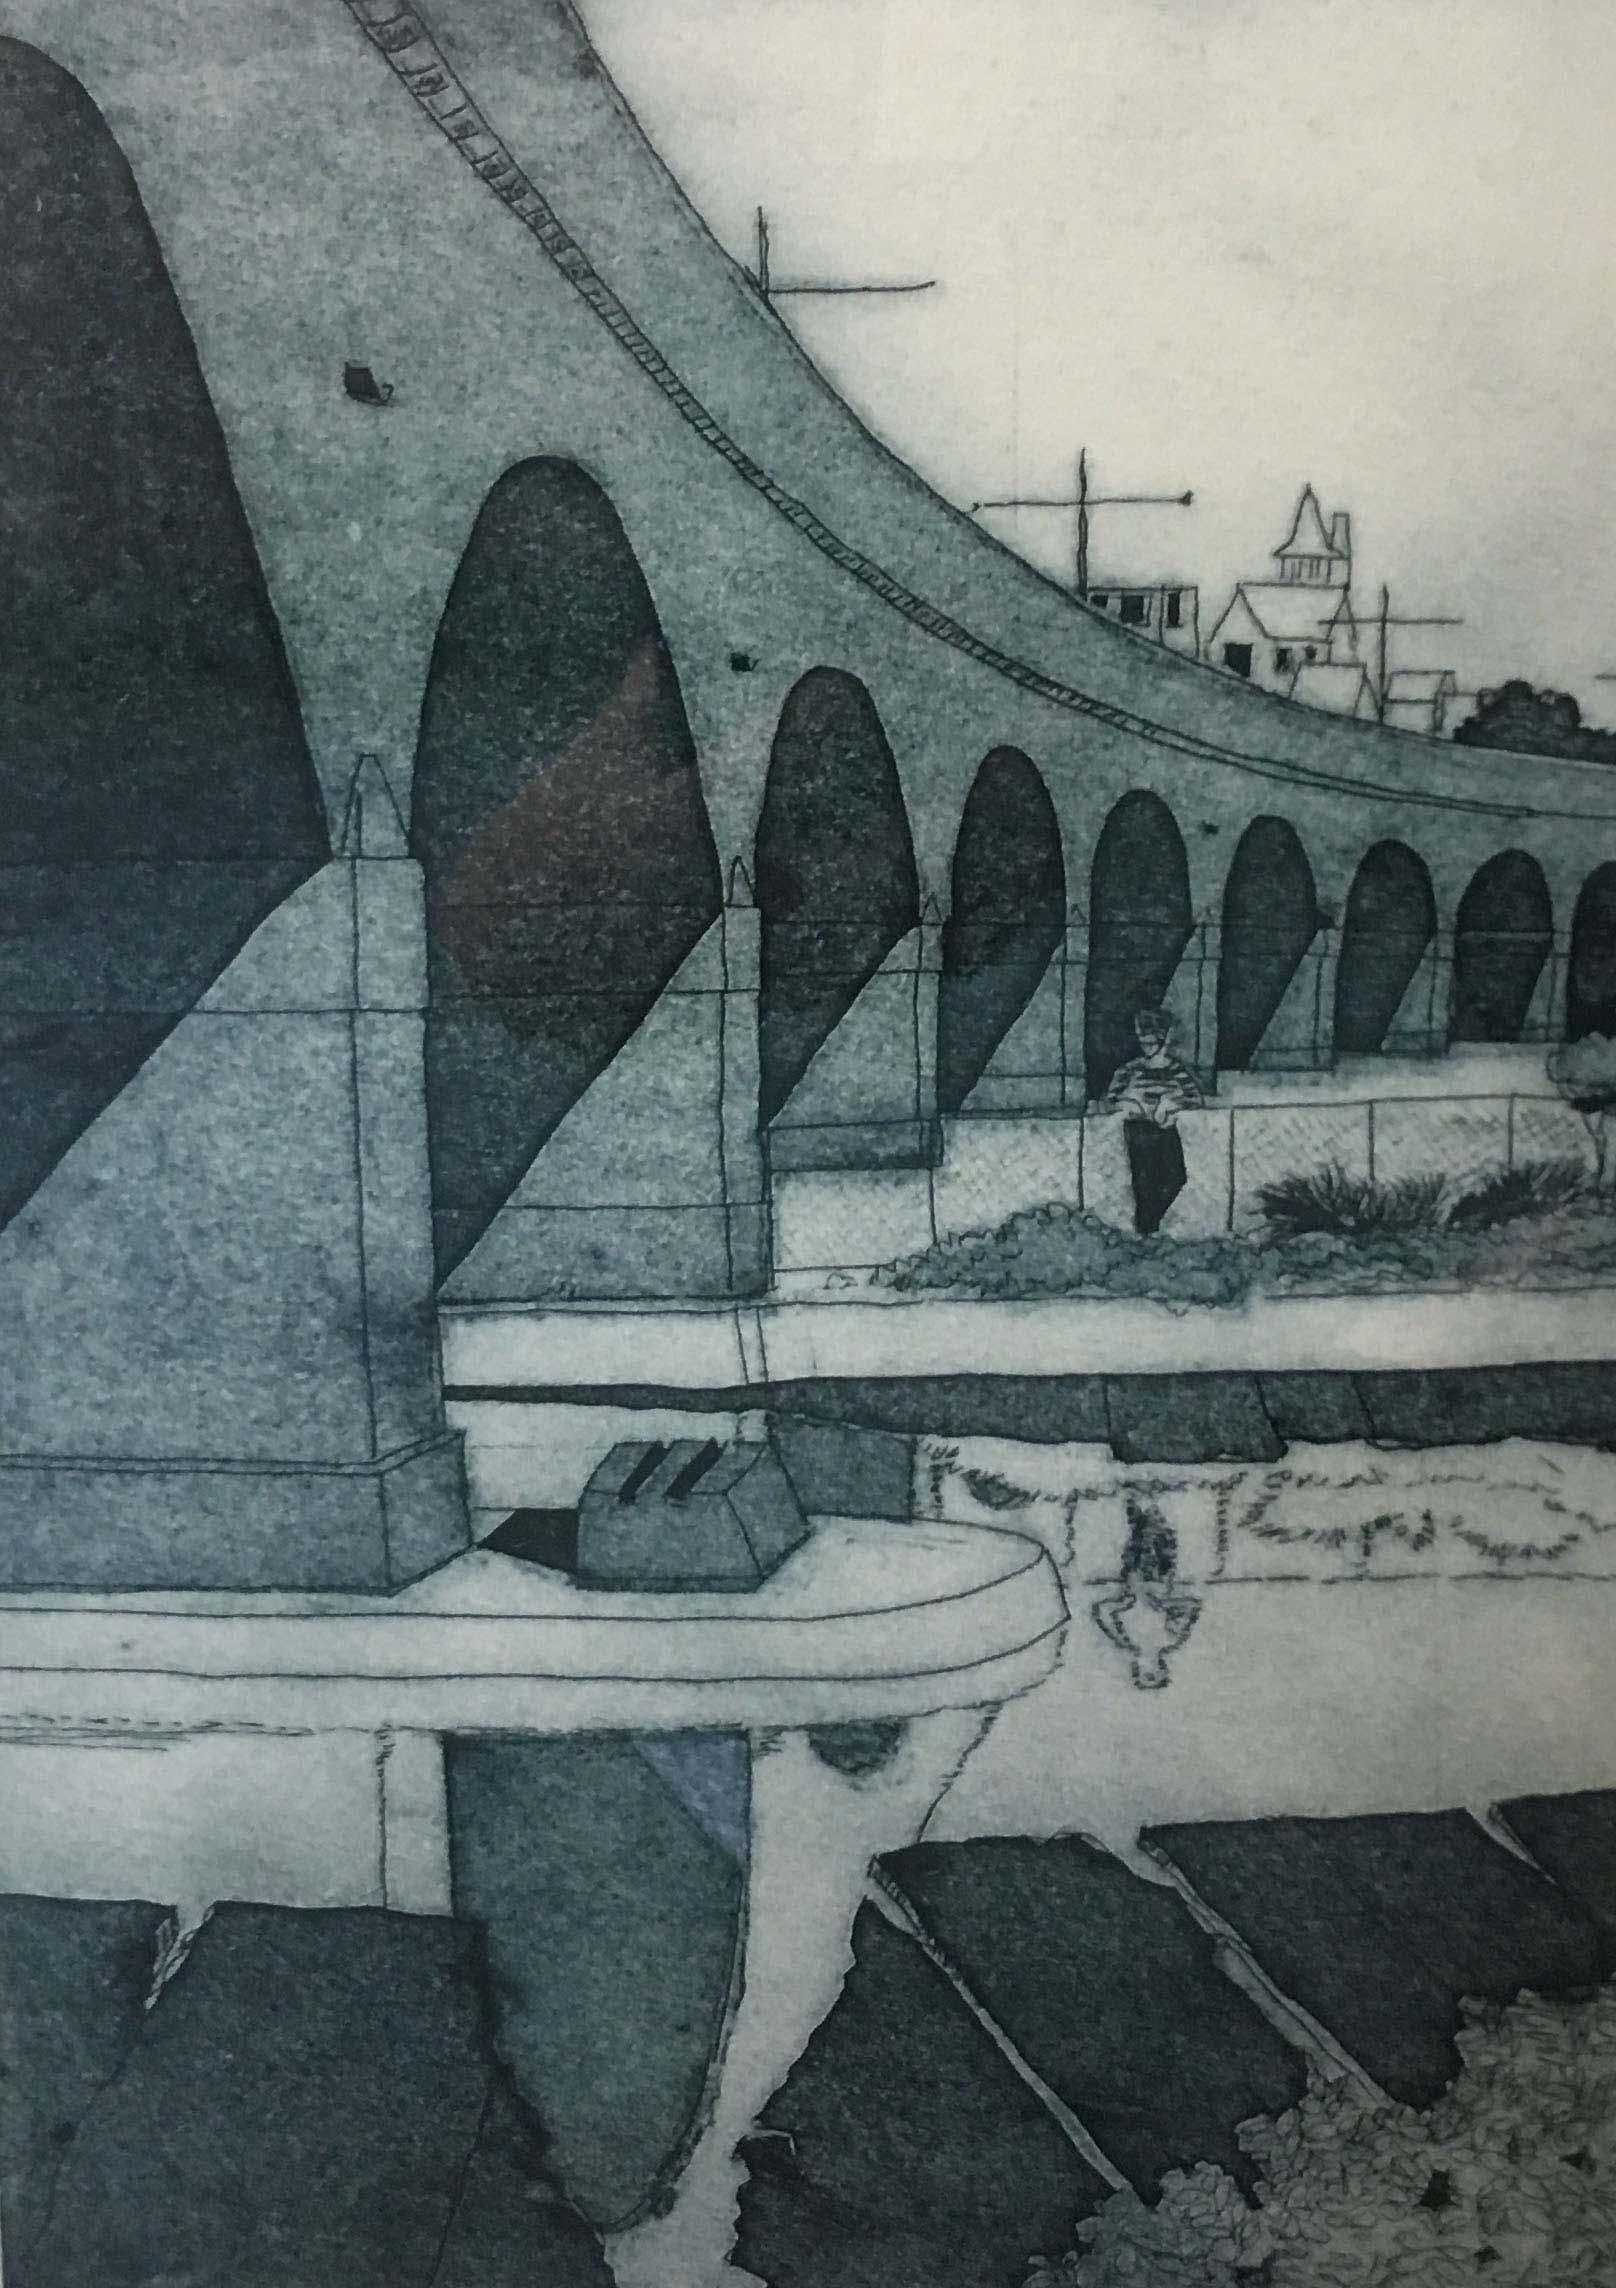 Viaduct Johnstons Creek